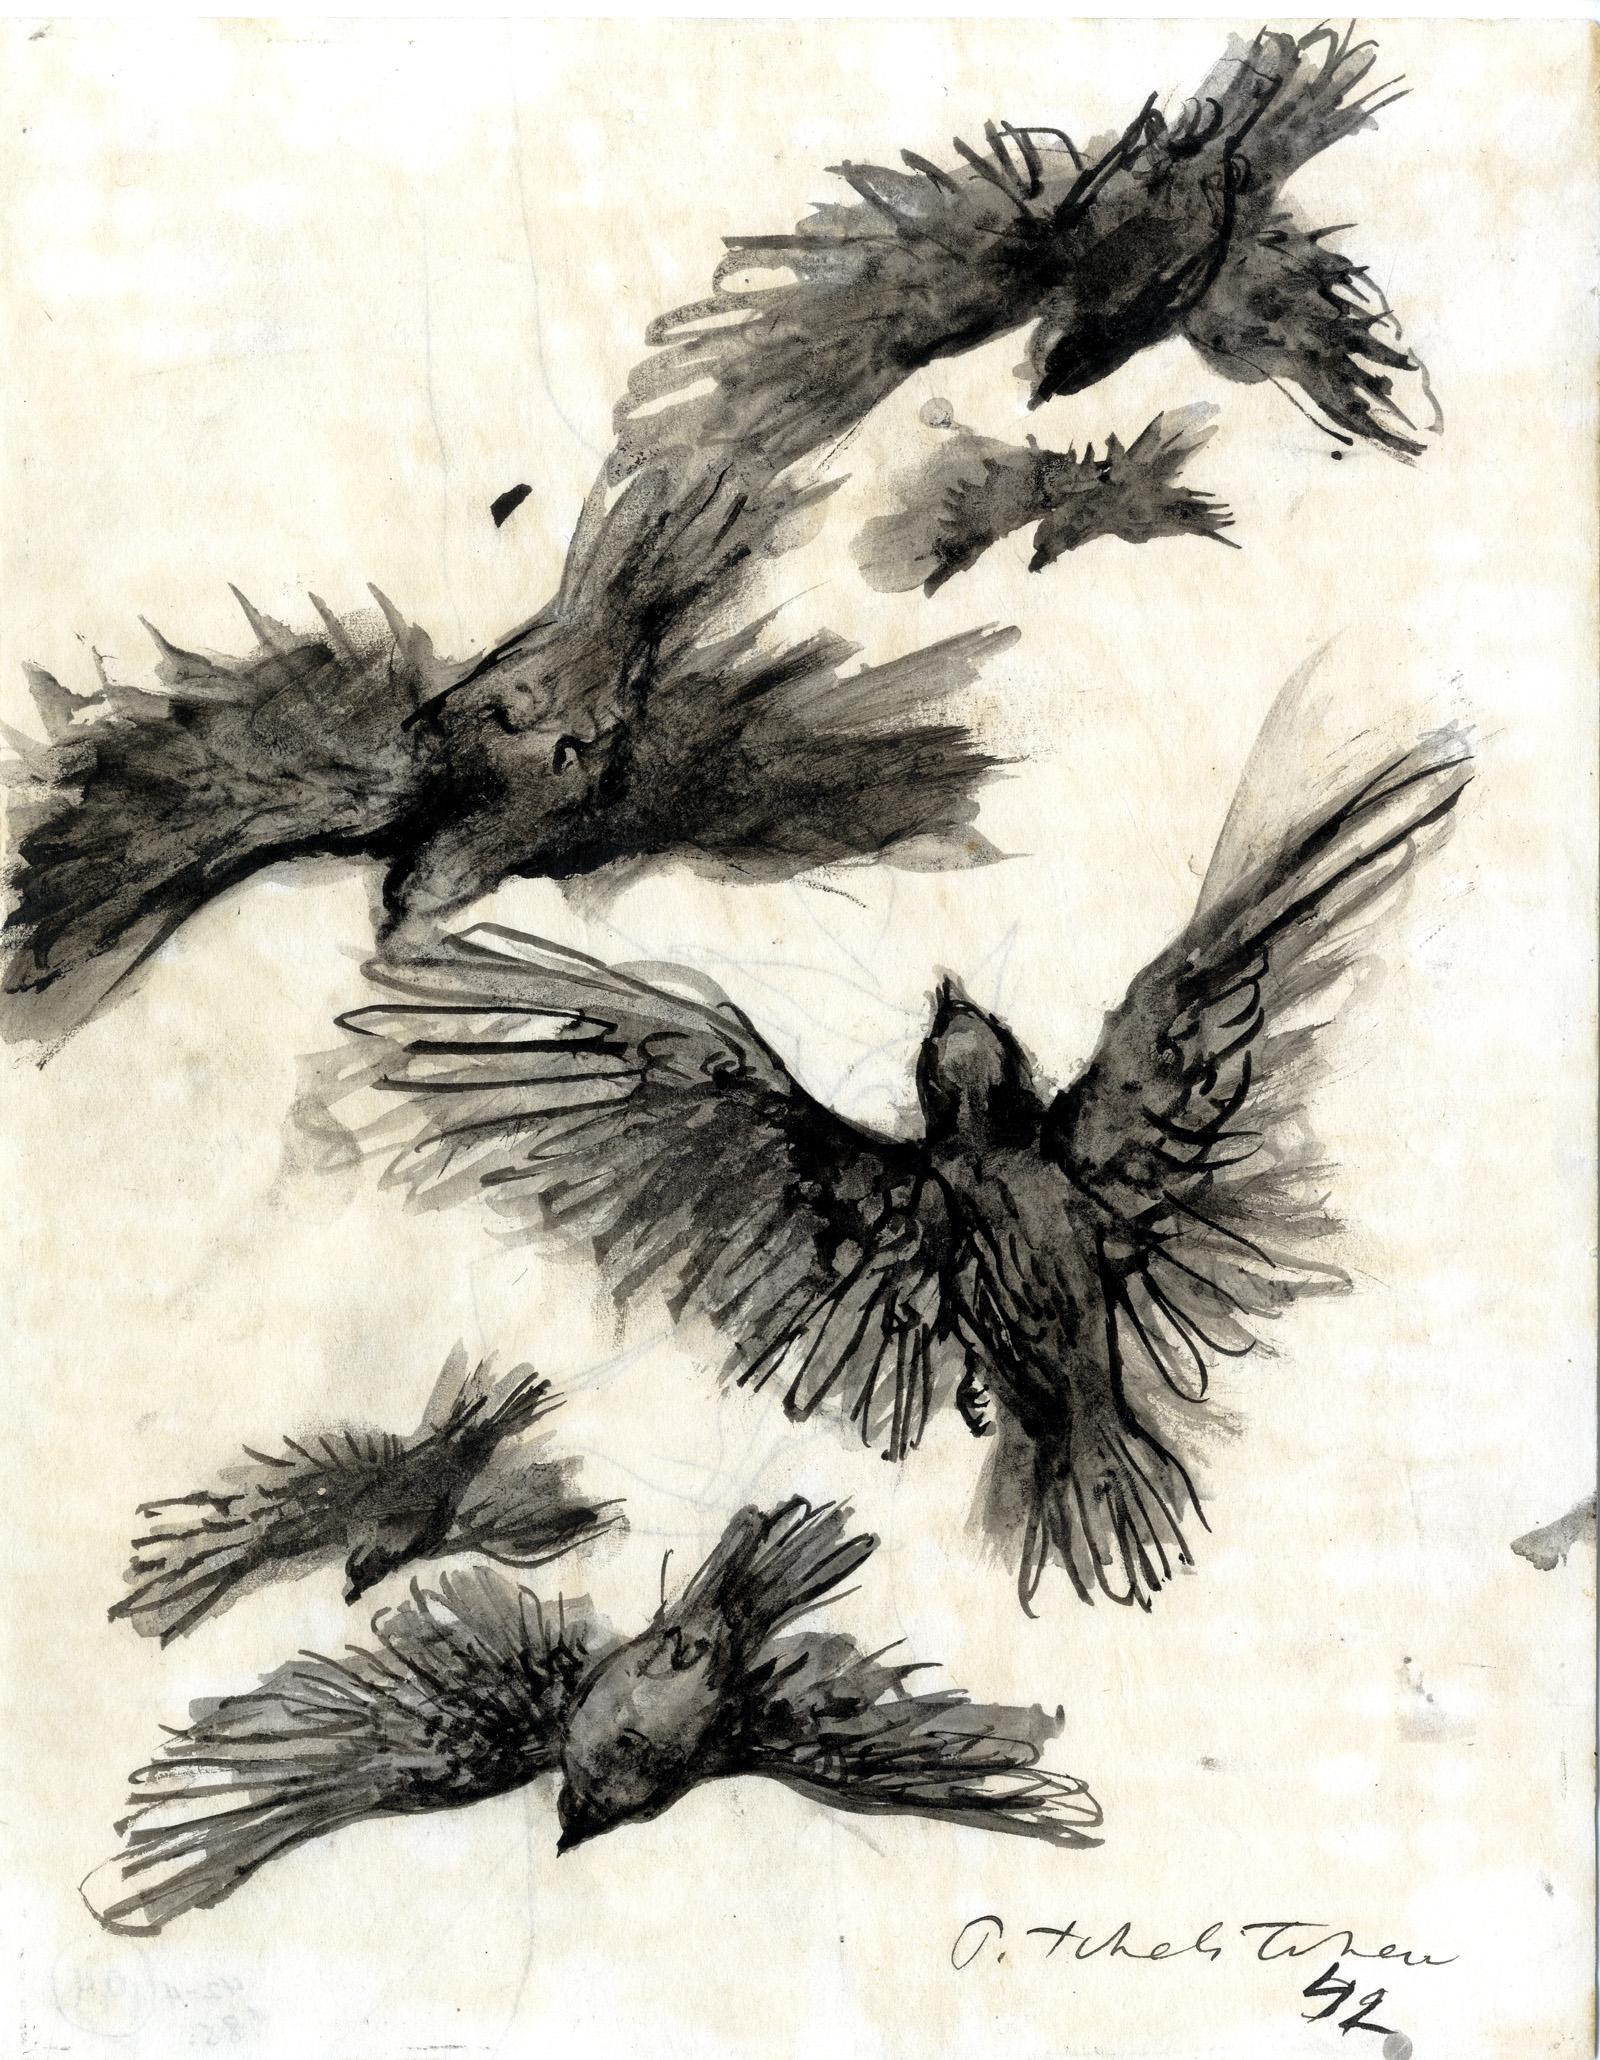 Pavel Tchelitchew: Birds in flight